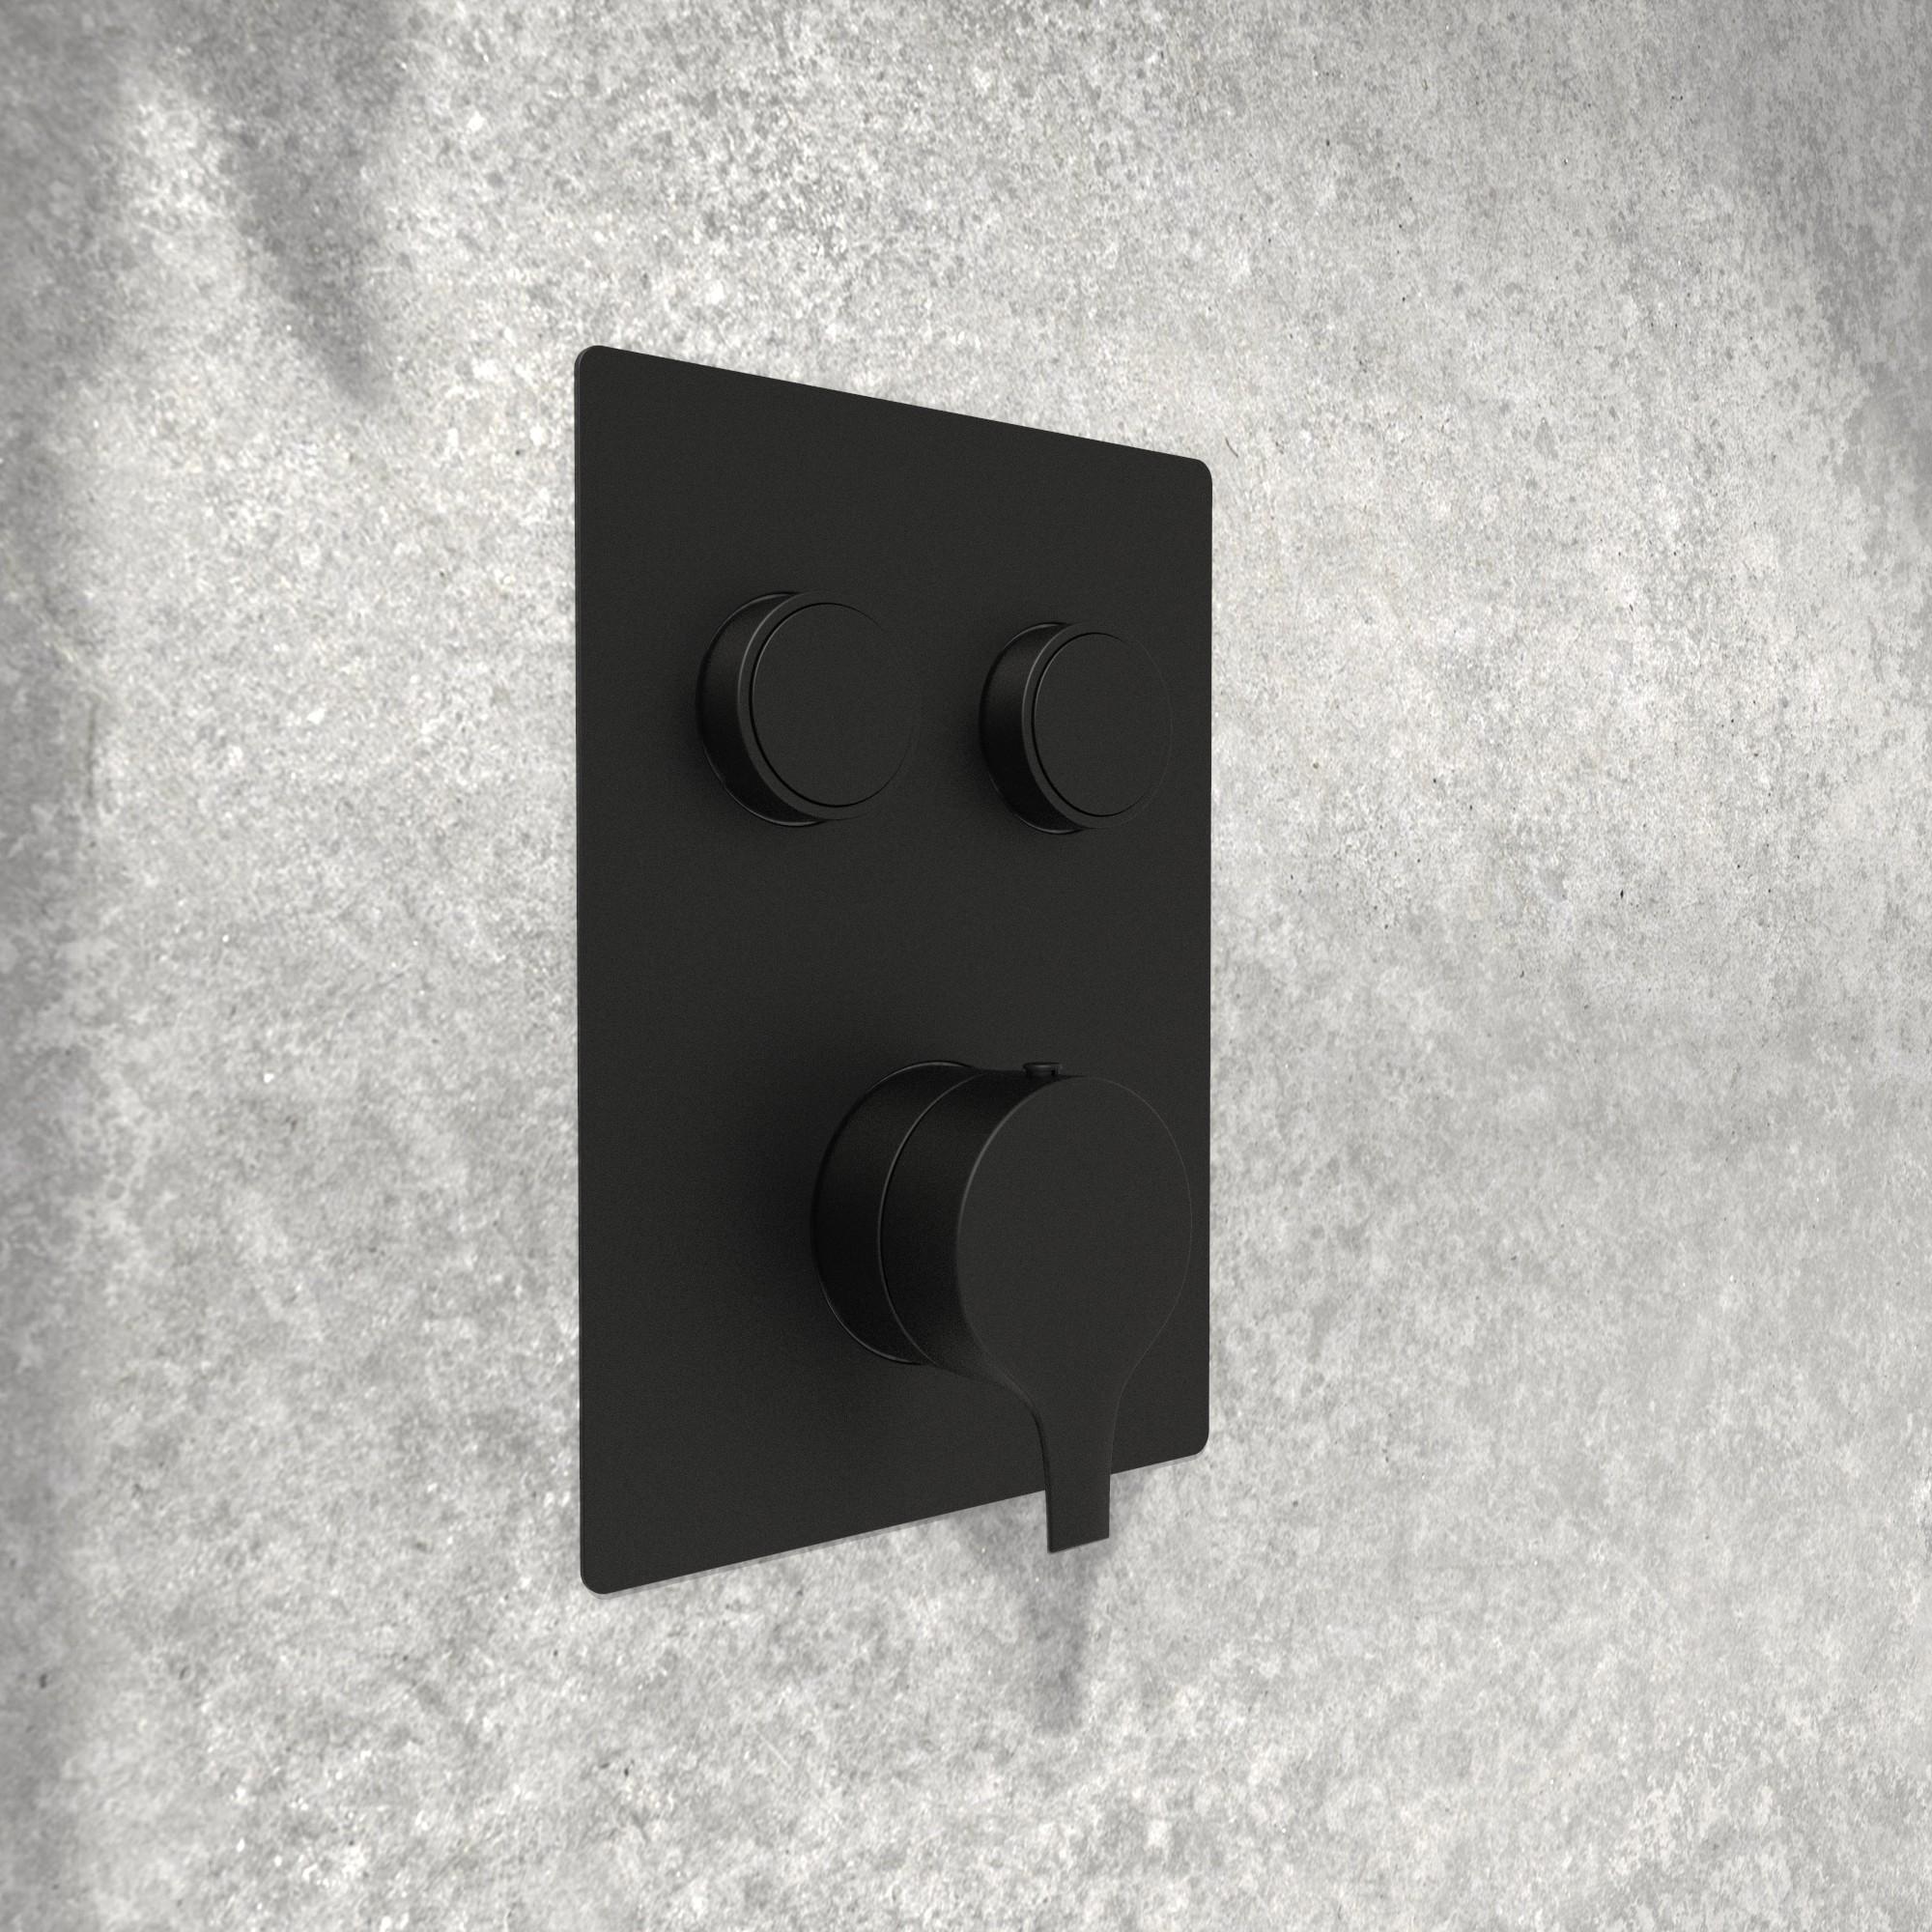 NOB98TS2DBTMB valve de robinet de douche noir mat sur fond pierre